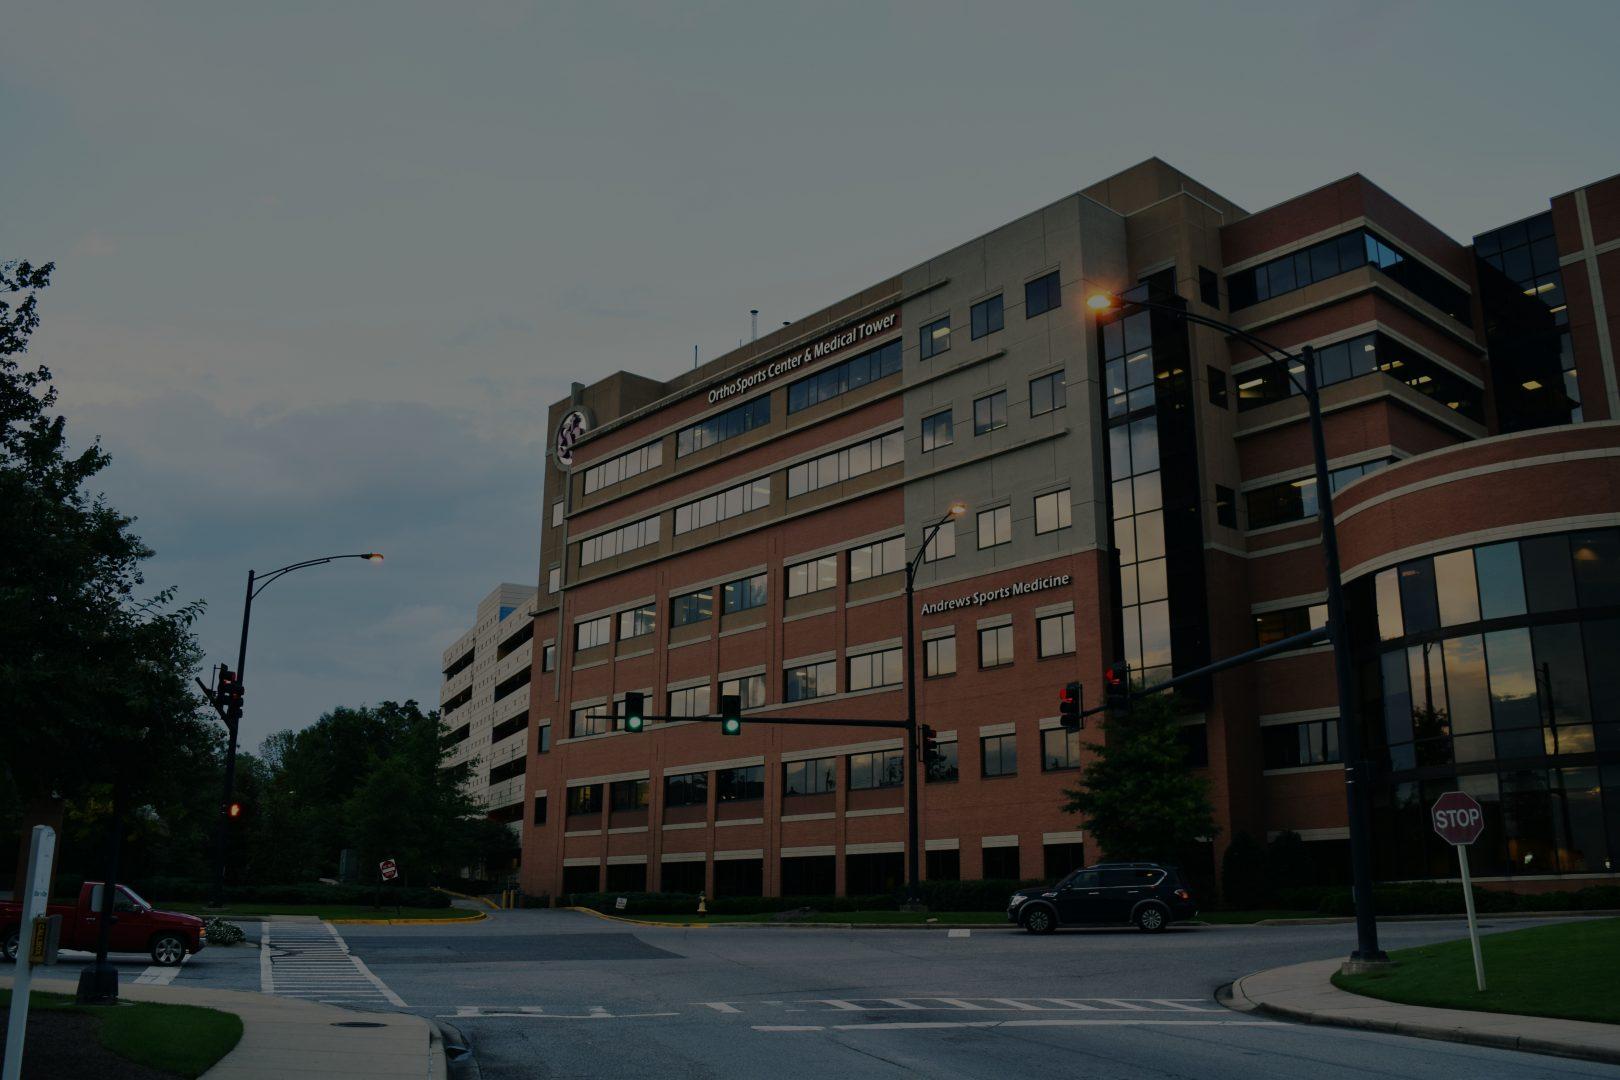 Work within Birmingham's most prestigious medical facilities